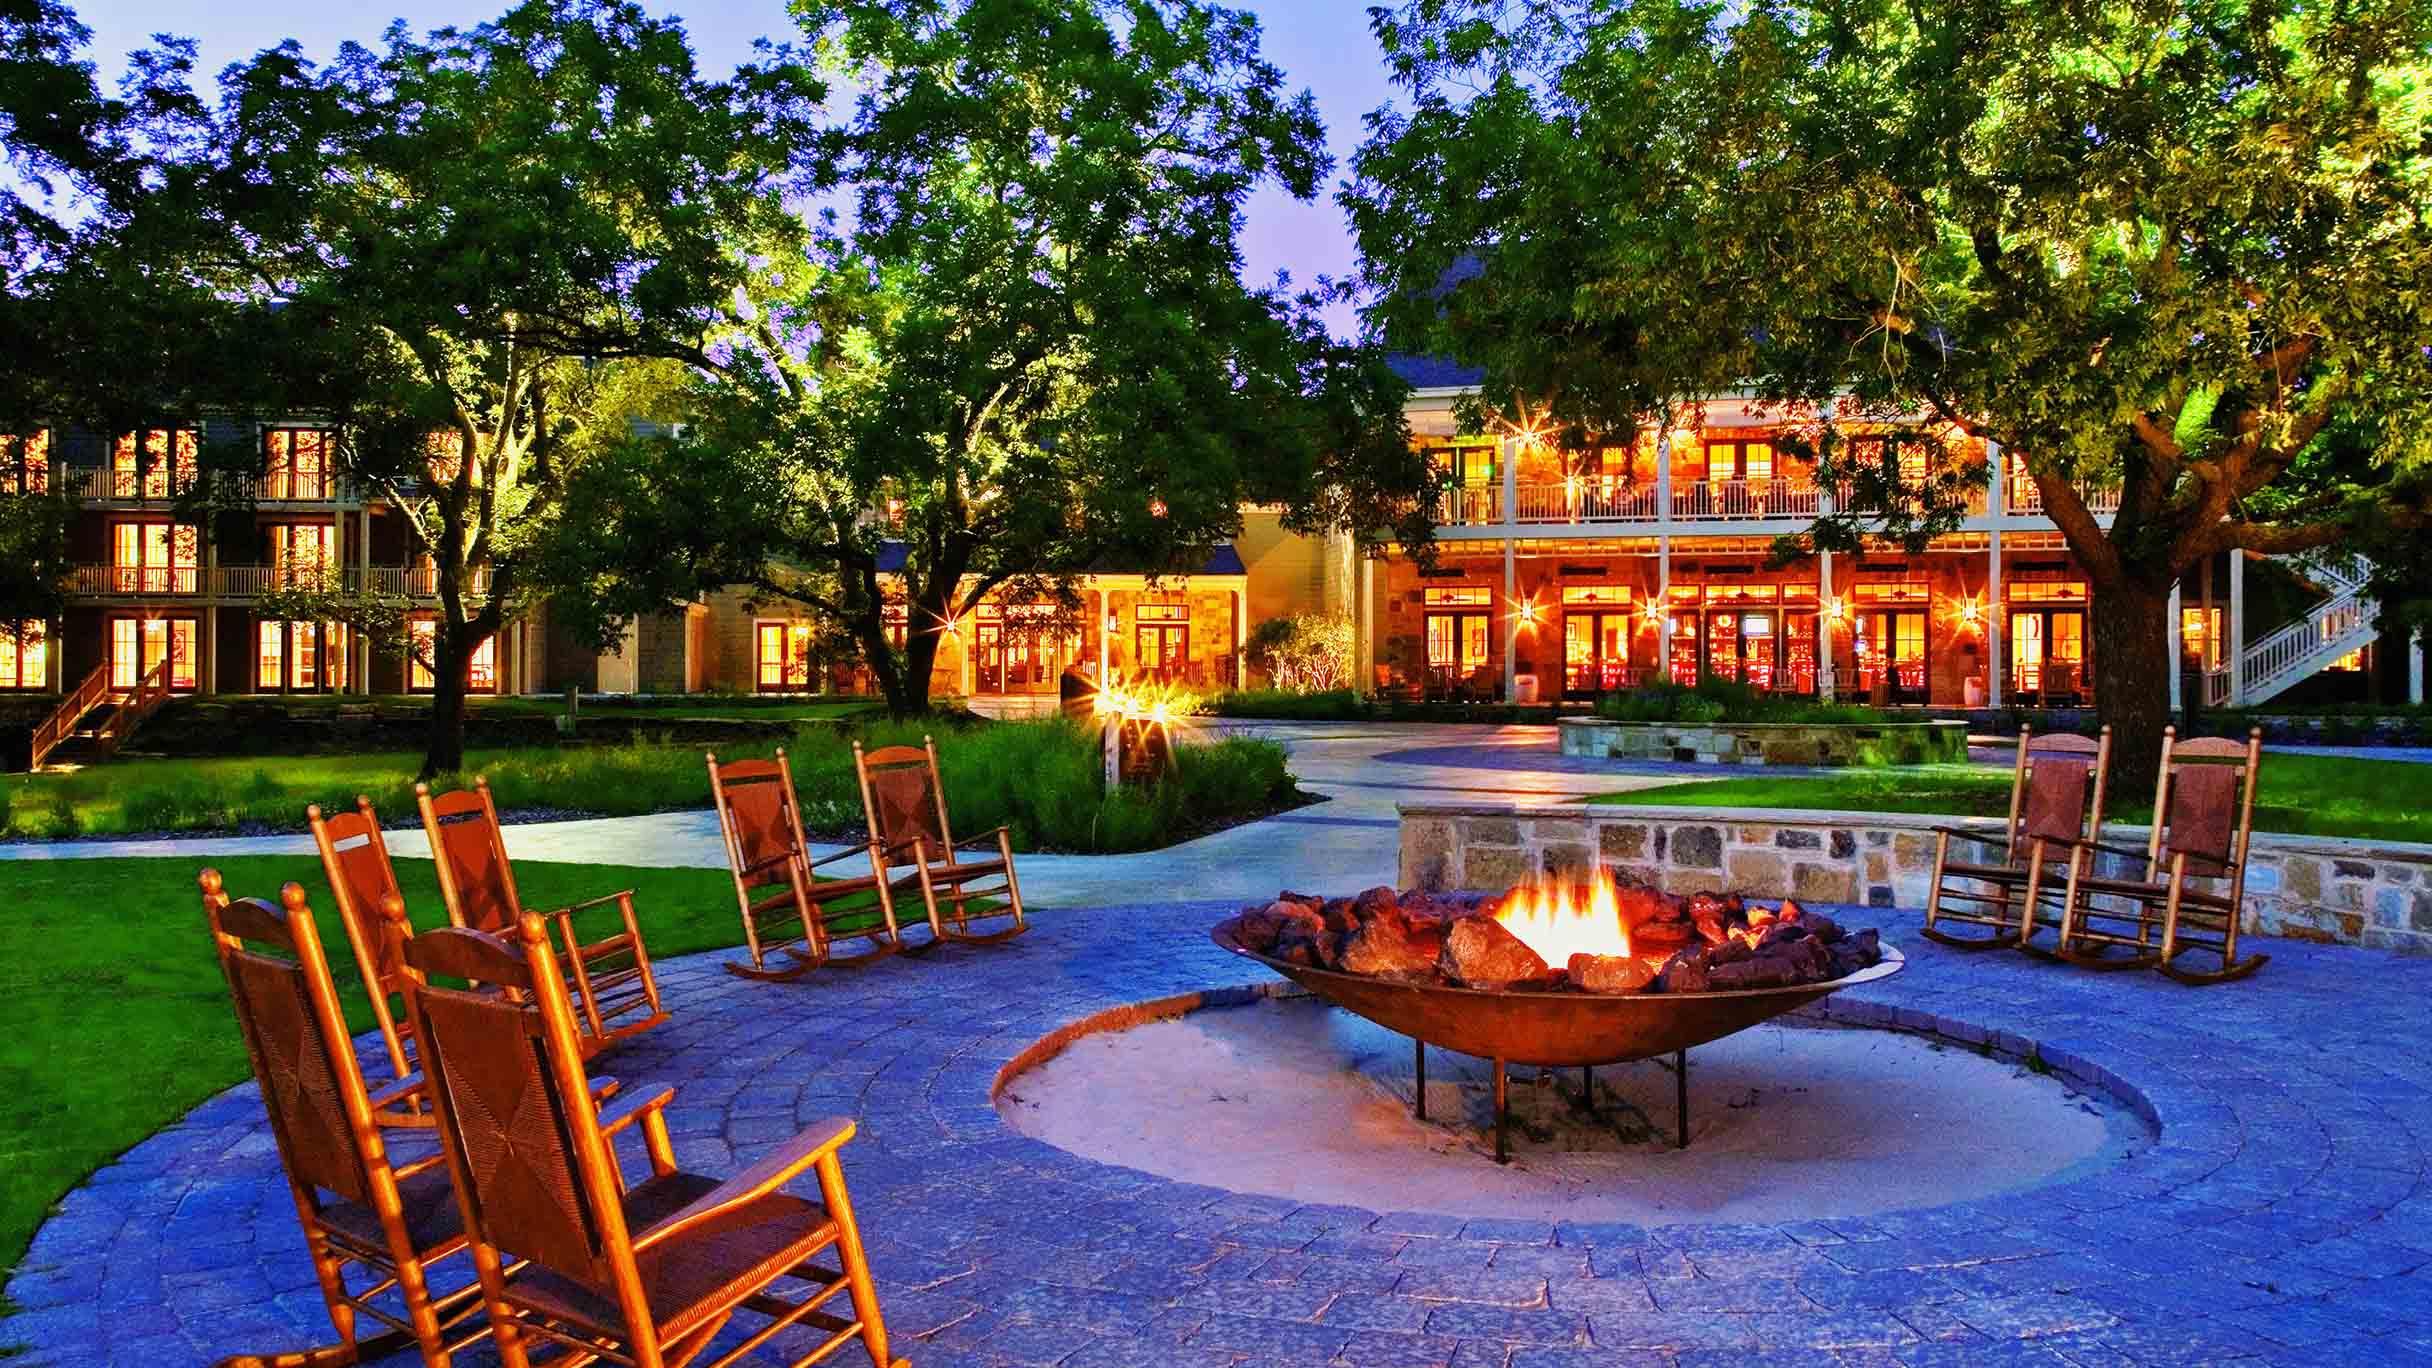 GE Digital User Conference | 2019 | Hyatt Lost Pines Resort, Austin, TX